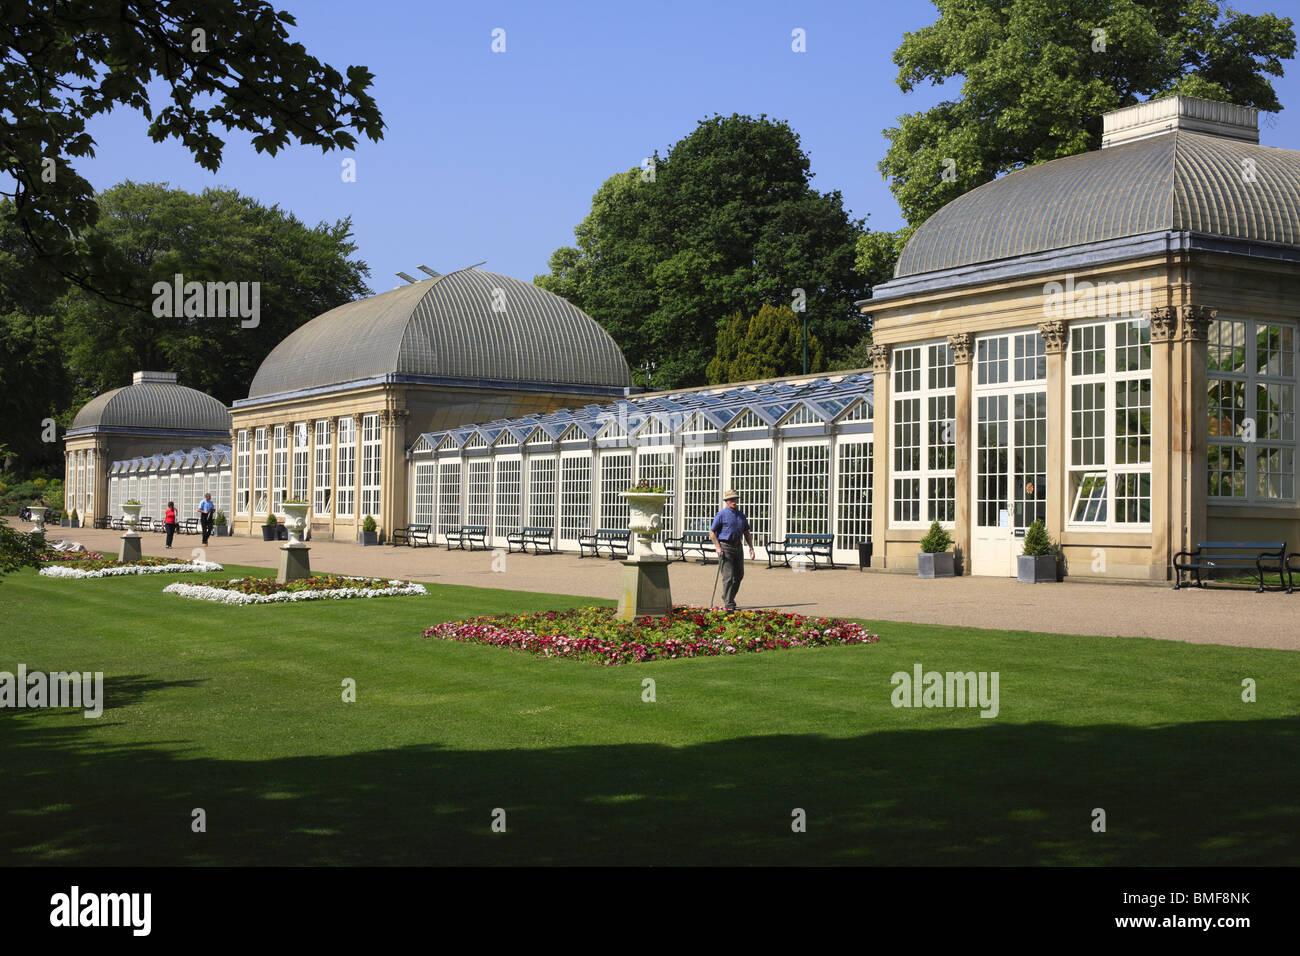 Sheffield Botanical Gardens Immagini Stock